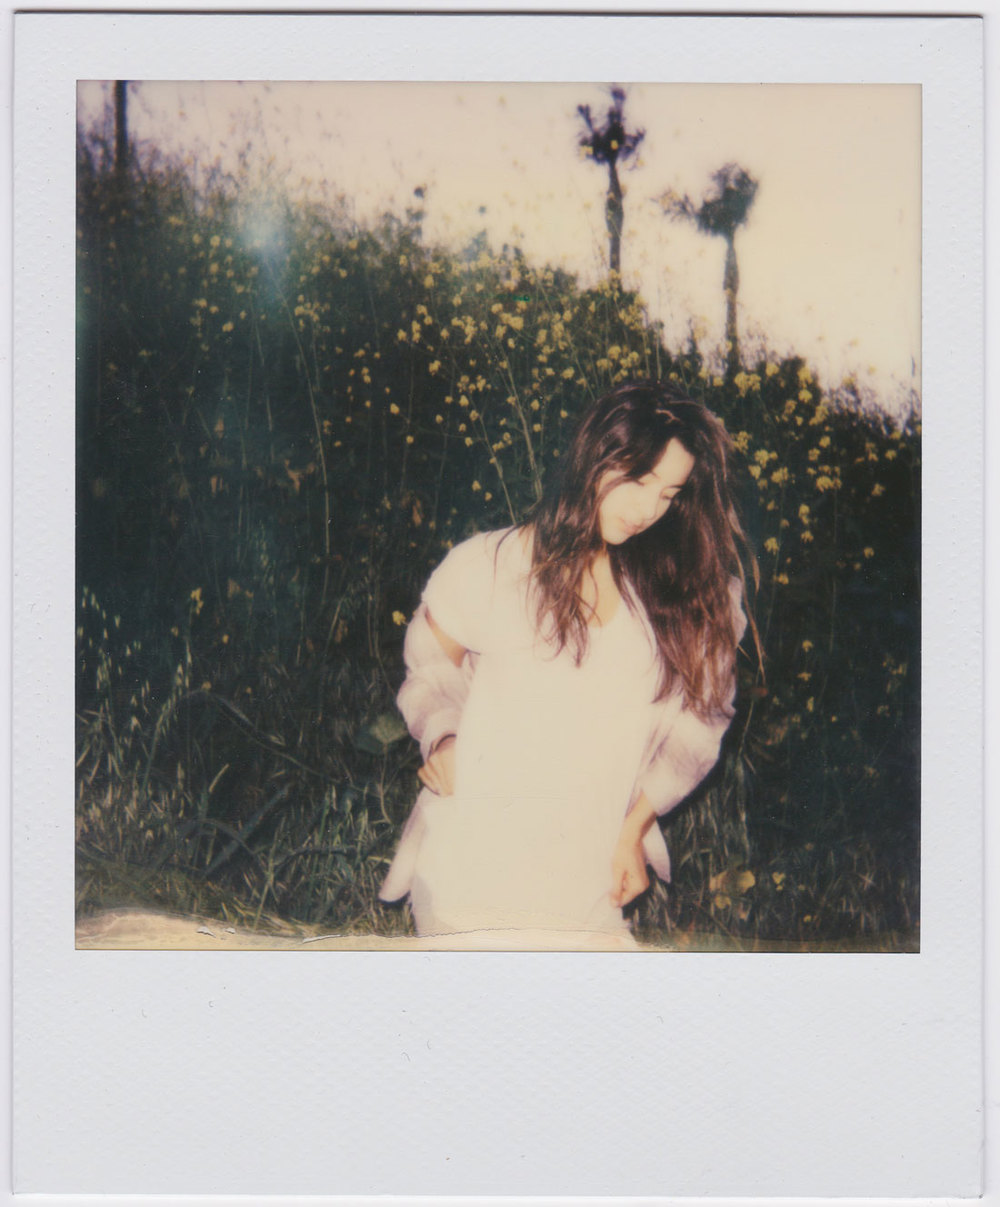 christina_choi_cxchoi_polaroid_7.jpg